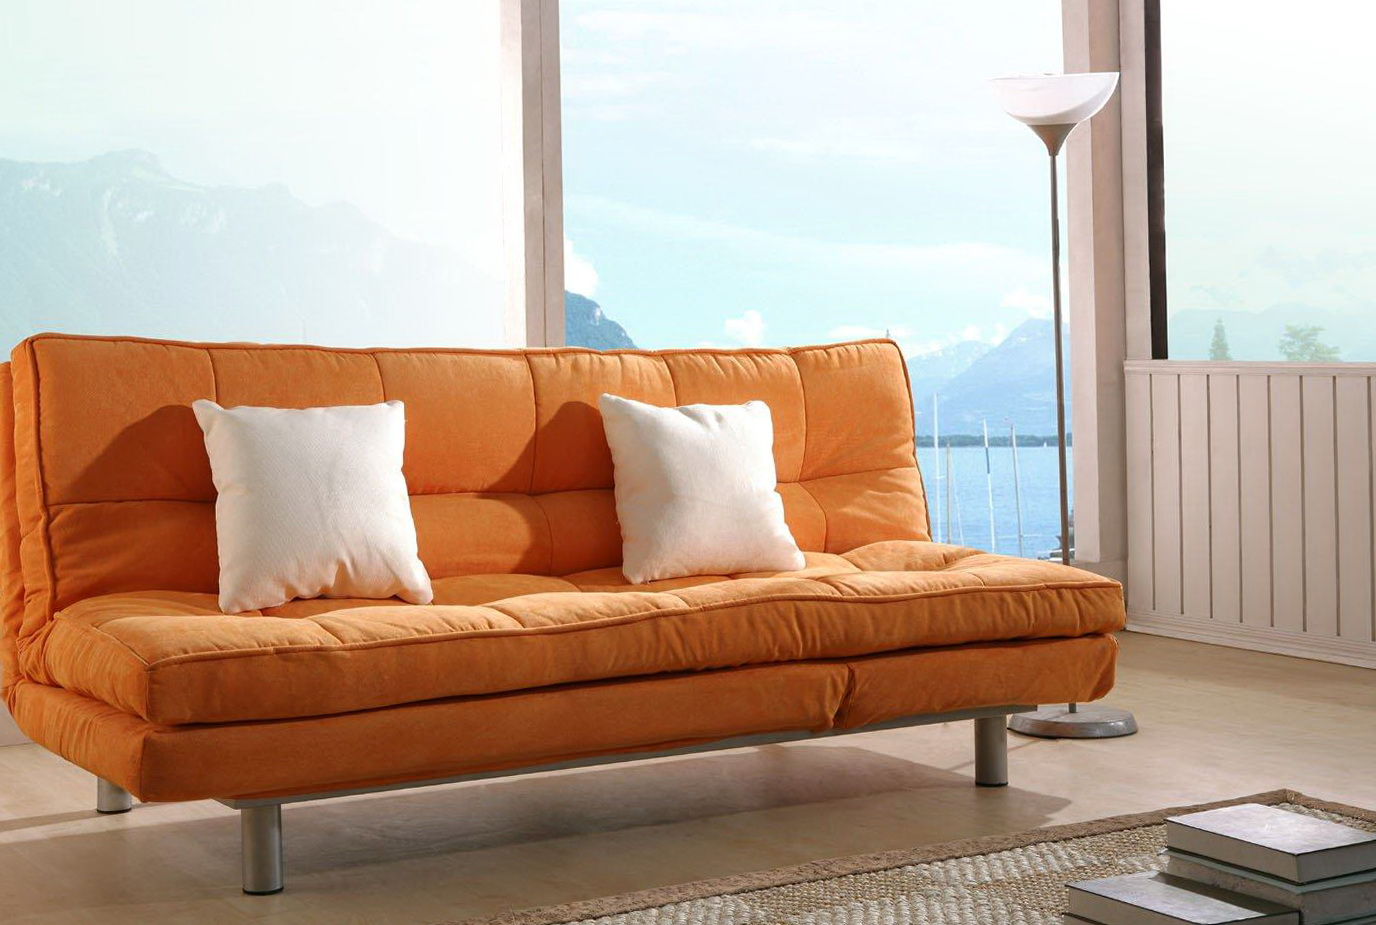 Restoration Hardware Sofa Sleeper